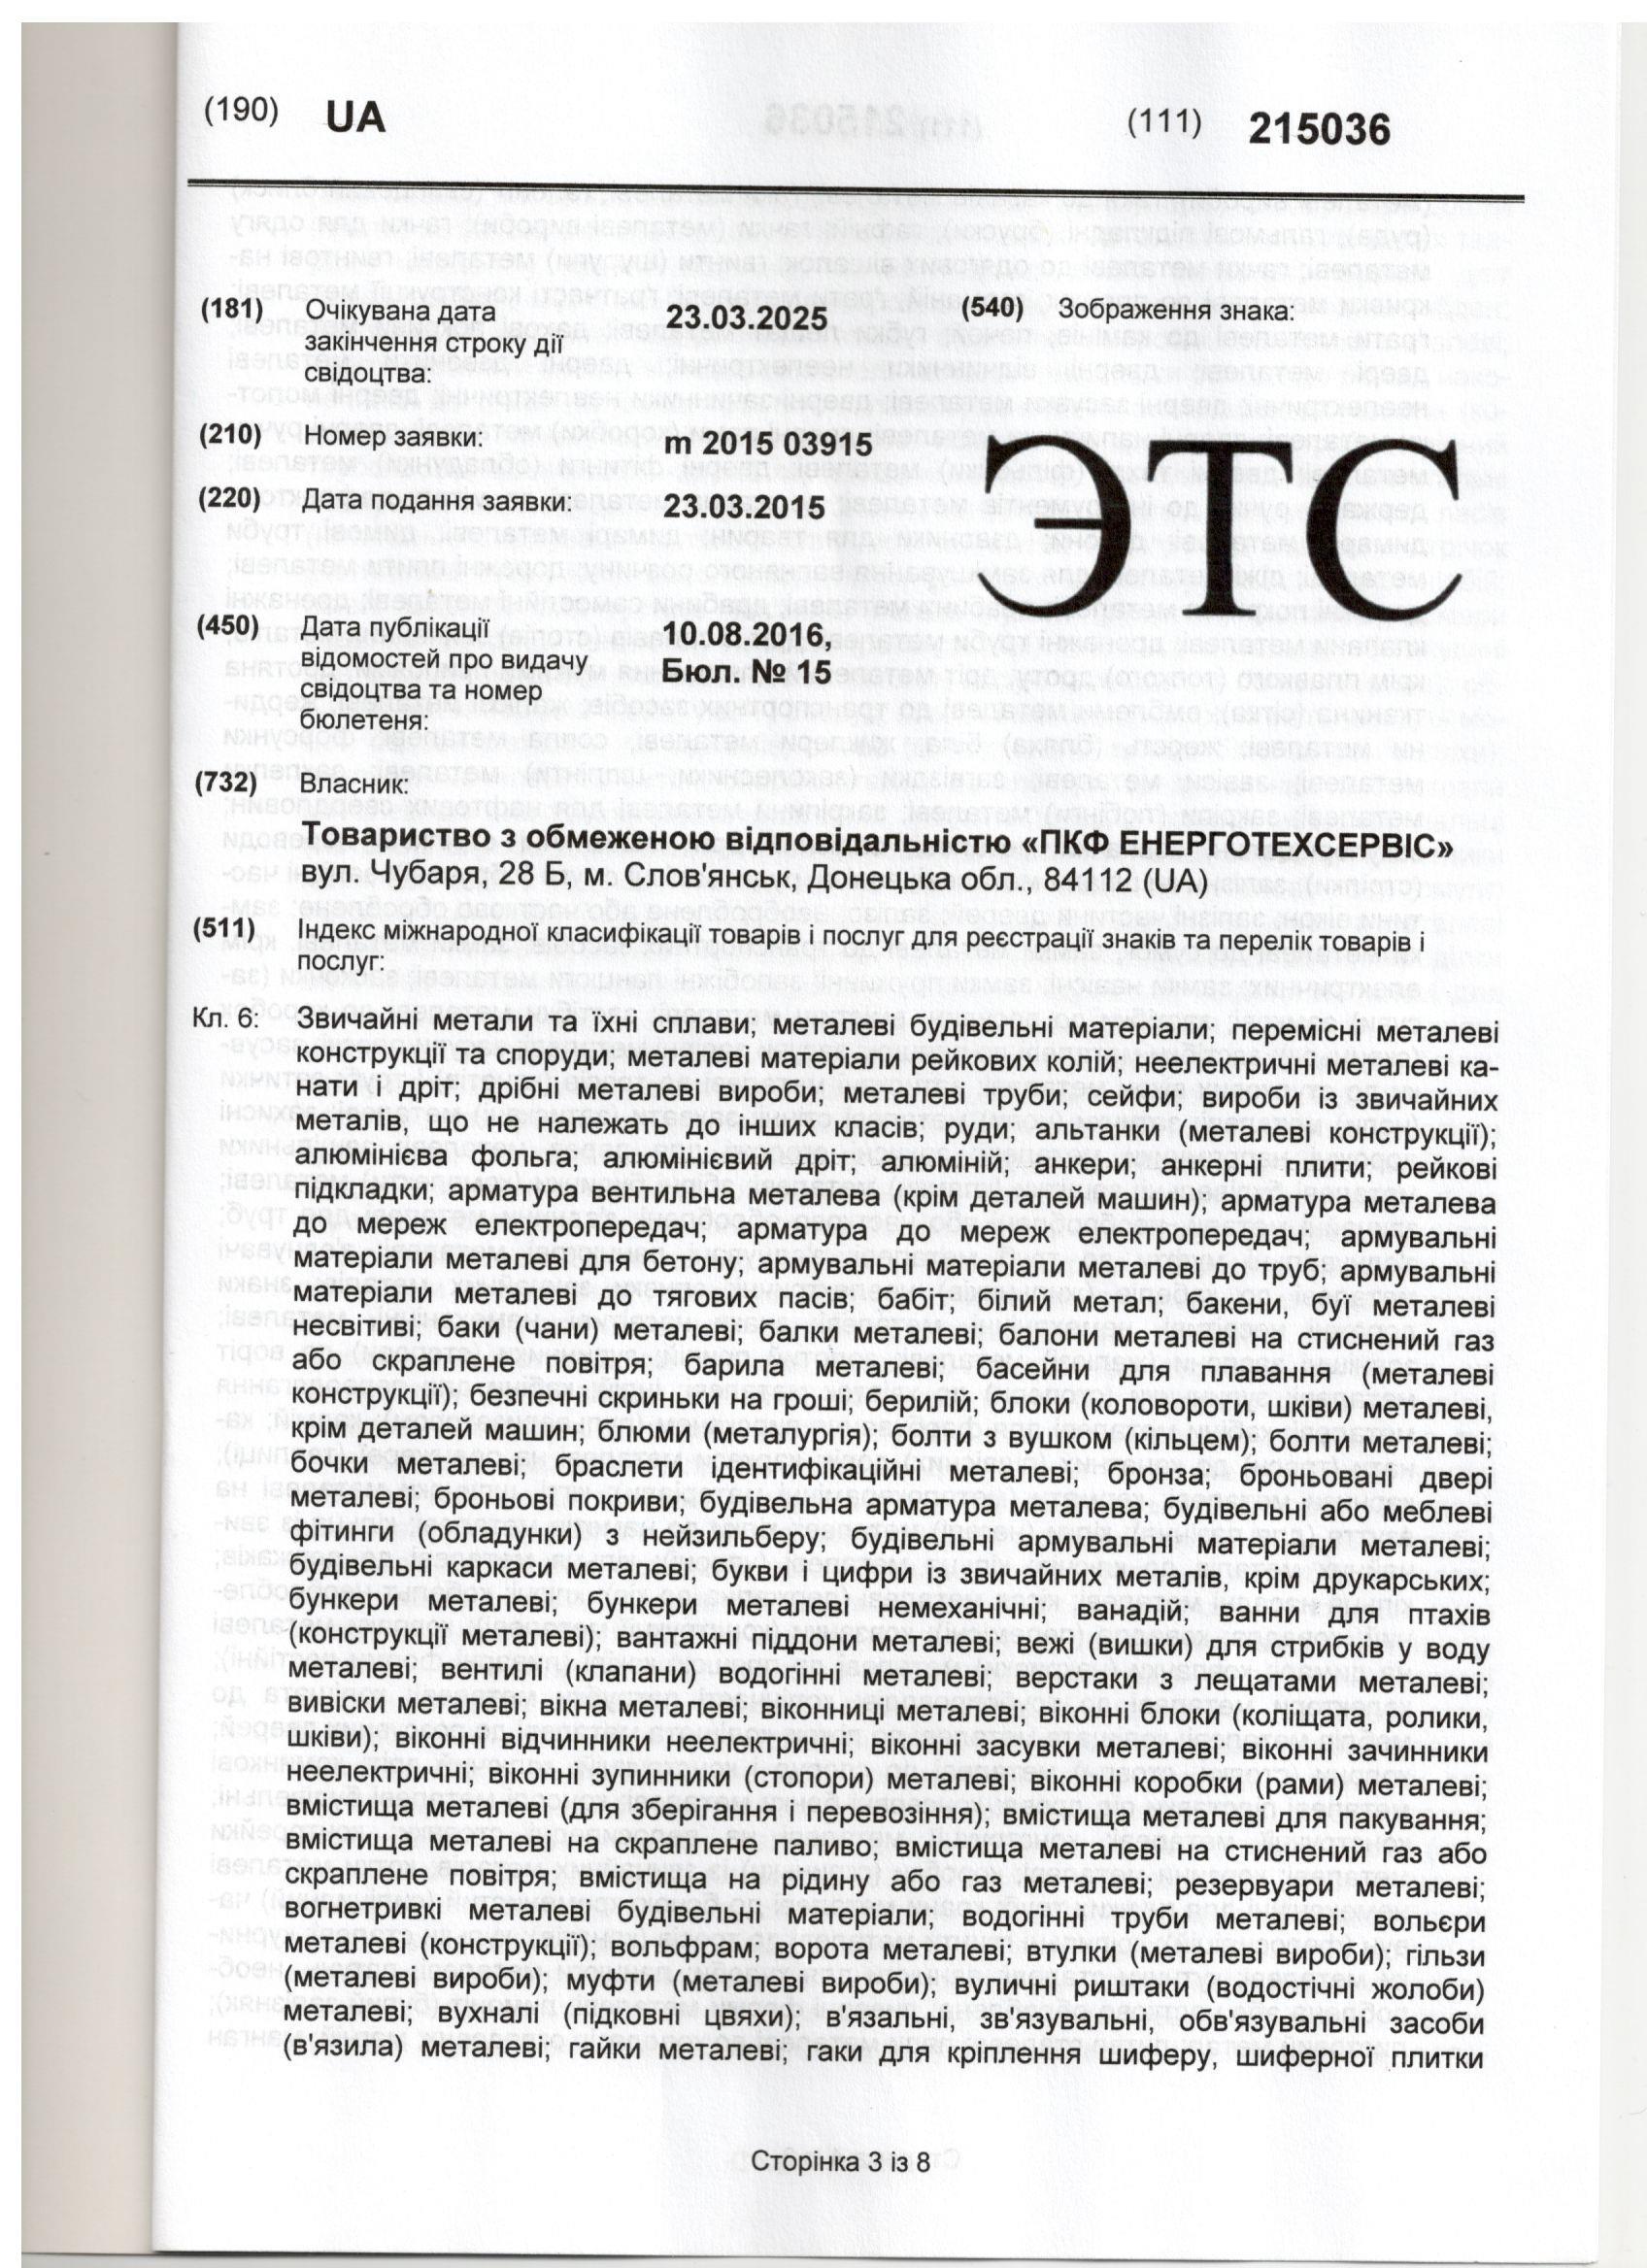 ПКФ Энерготехсервис, ООО